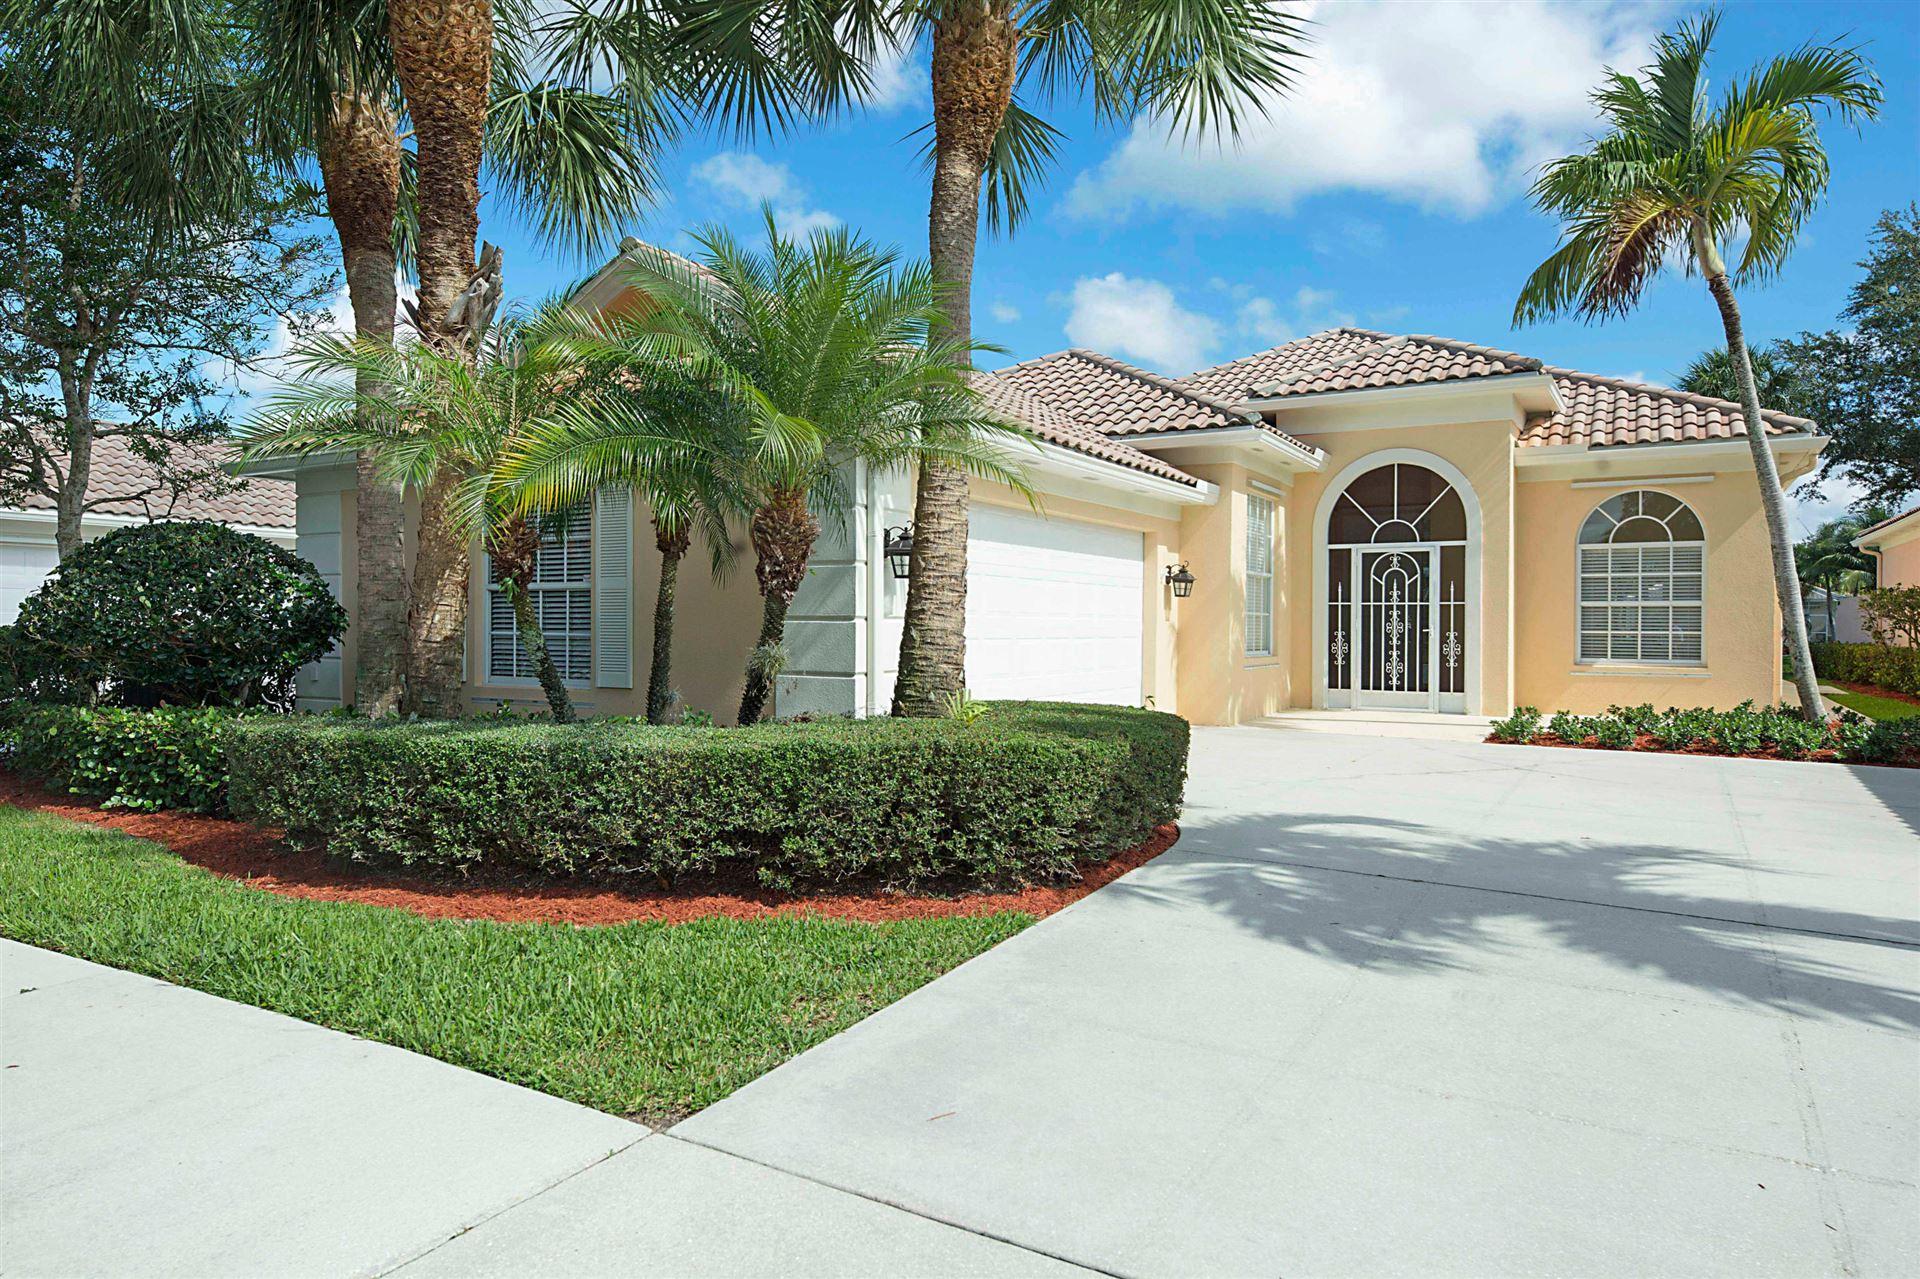 7711 Red River Road, West Palm Beach, FL 33411 - MLS#: RX-10734901